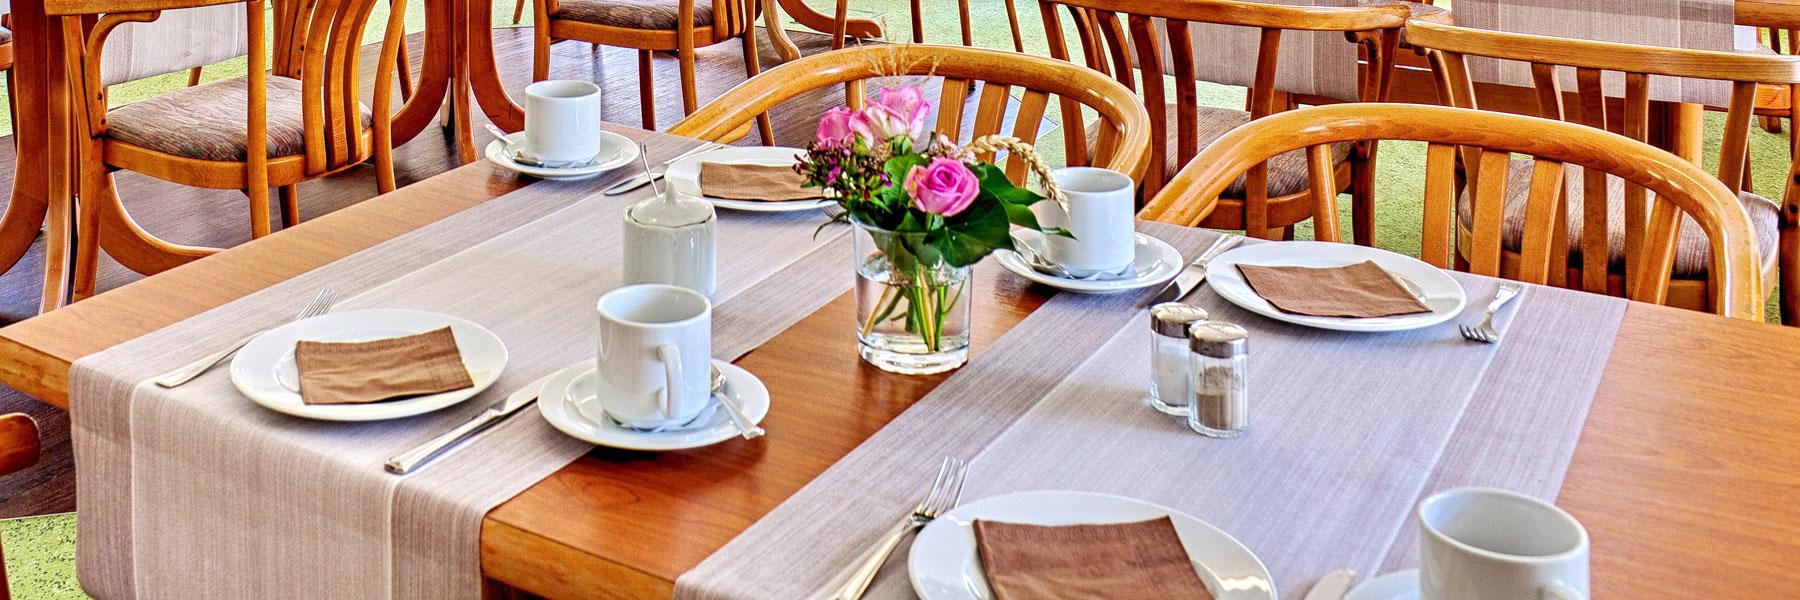 Frühstückstisch - Hotel Carmina am See